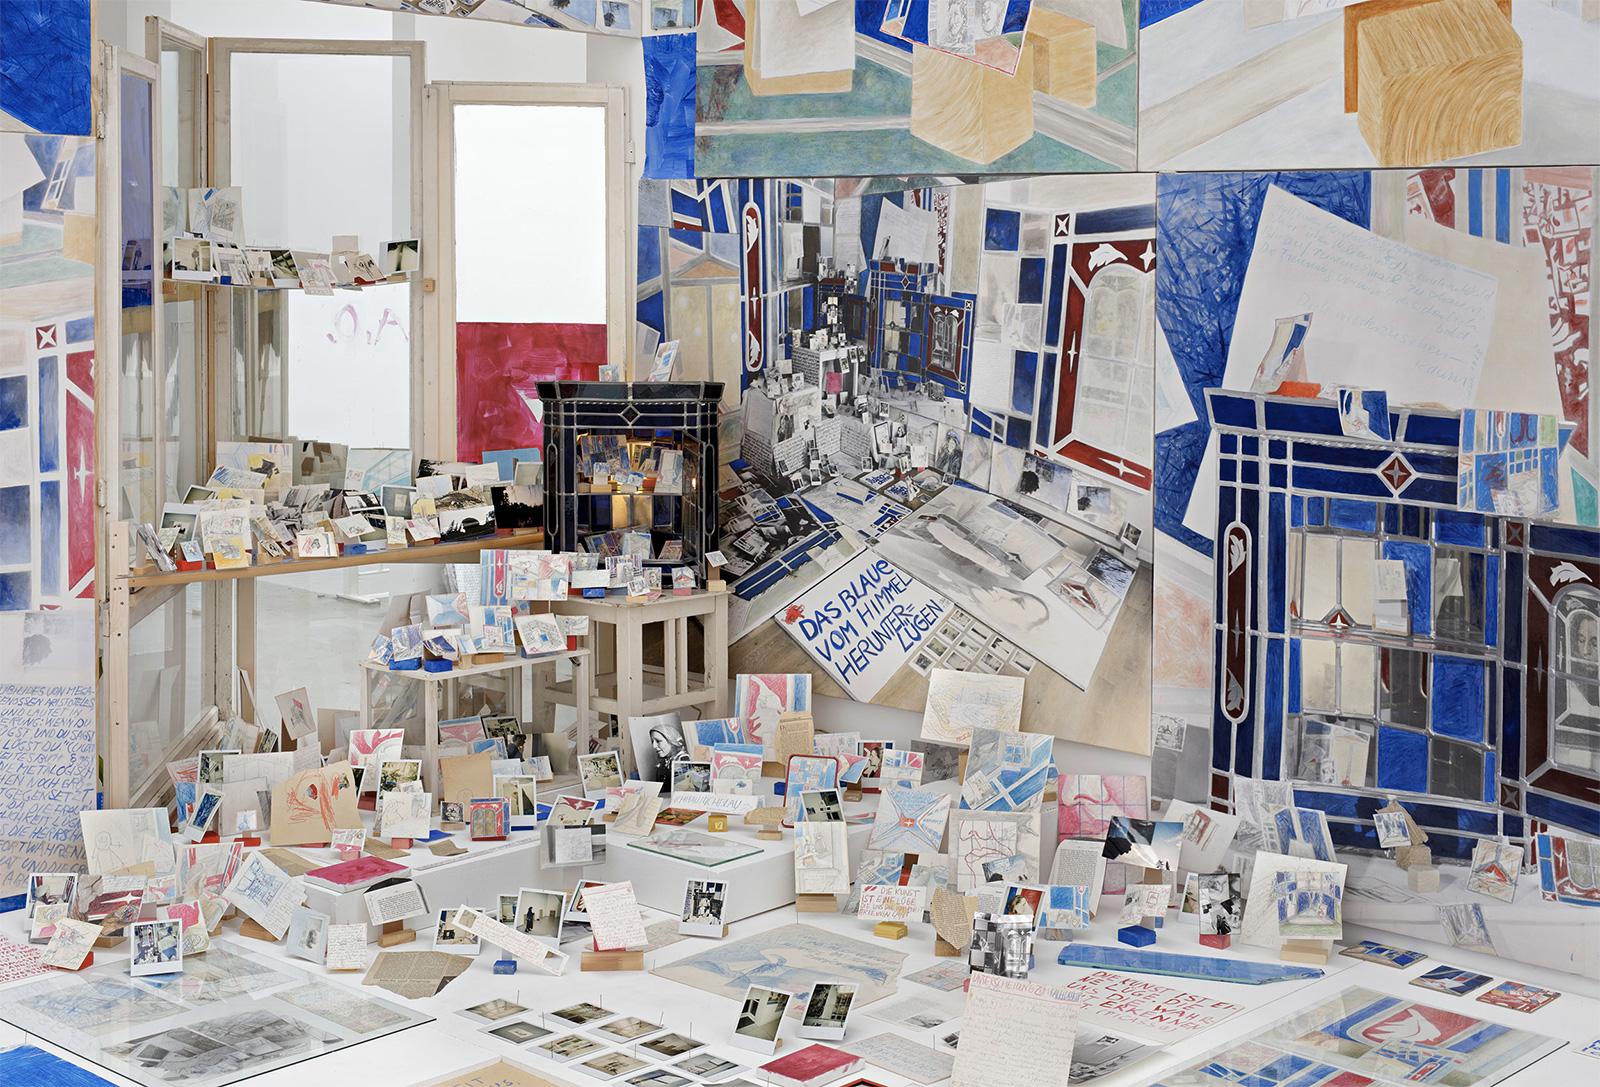 Installation view, Anna Oppermann, 'Paradoxe Intentionen, 1988/92. Galerie Barbara Thumm, Berlin, 2016. Courtesy the Estate Anna Oppermann and Galerie Barbara Thumm, Berlin. Photography: Jens Ziehe